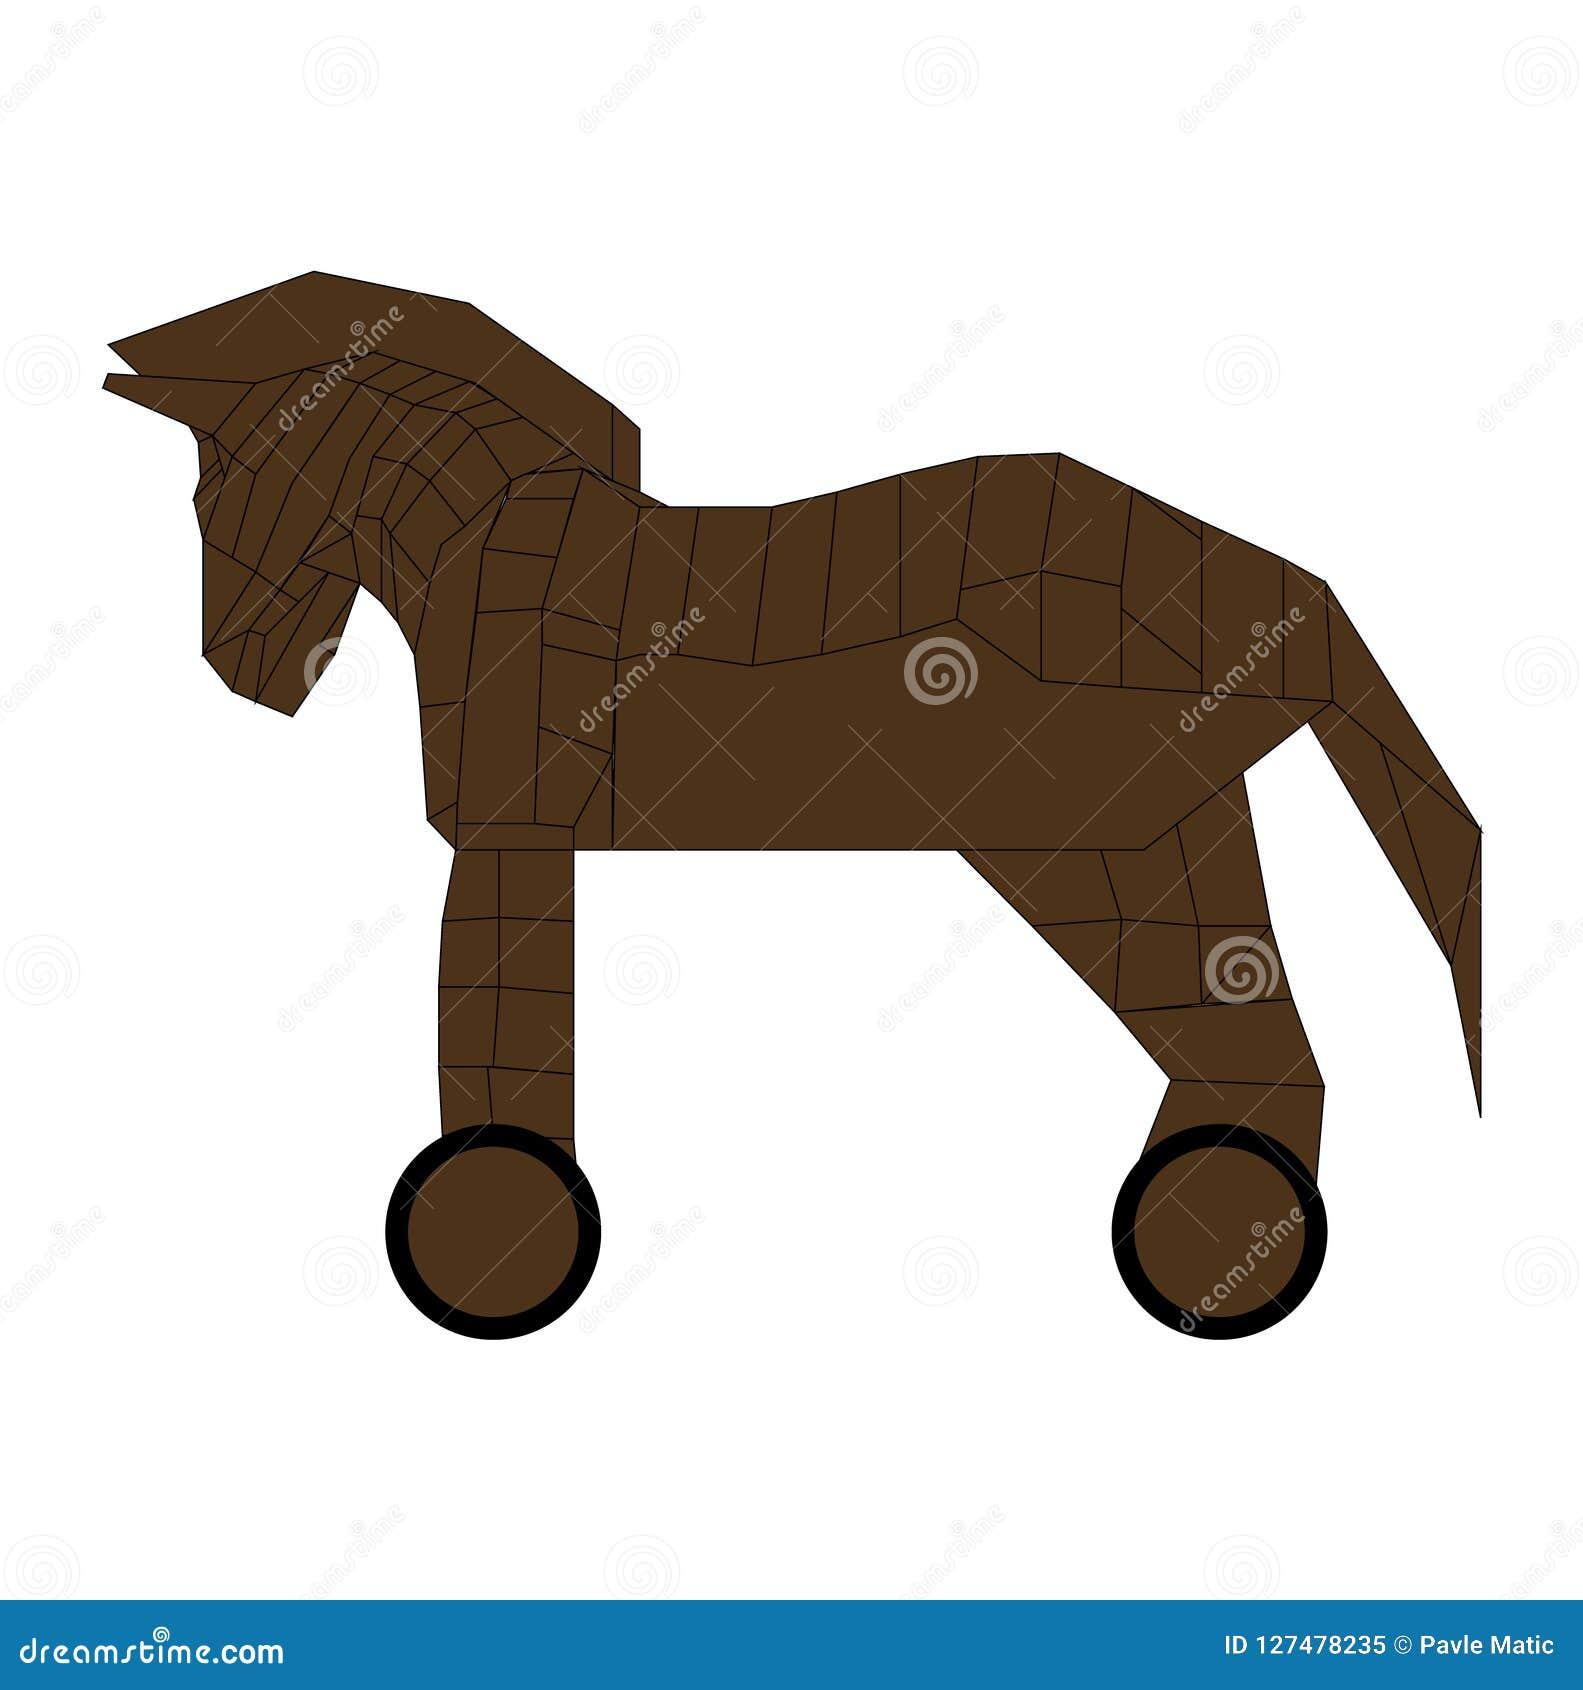 Wooden Trojan Horse Replica Cartoon Illustration Stock